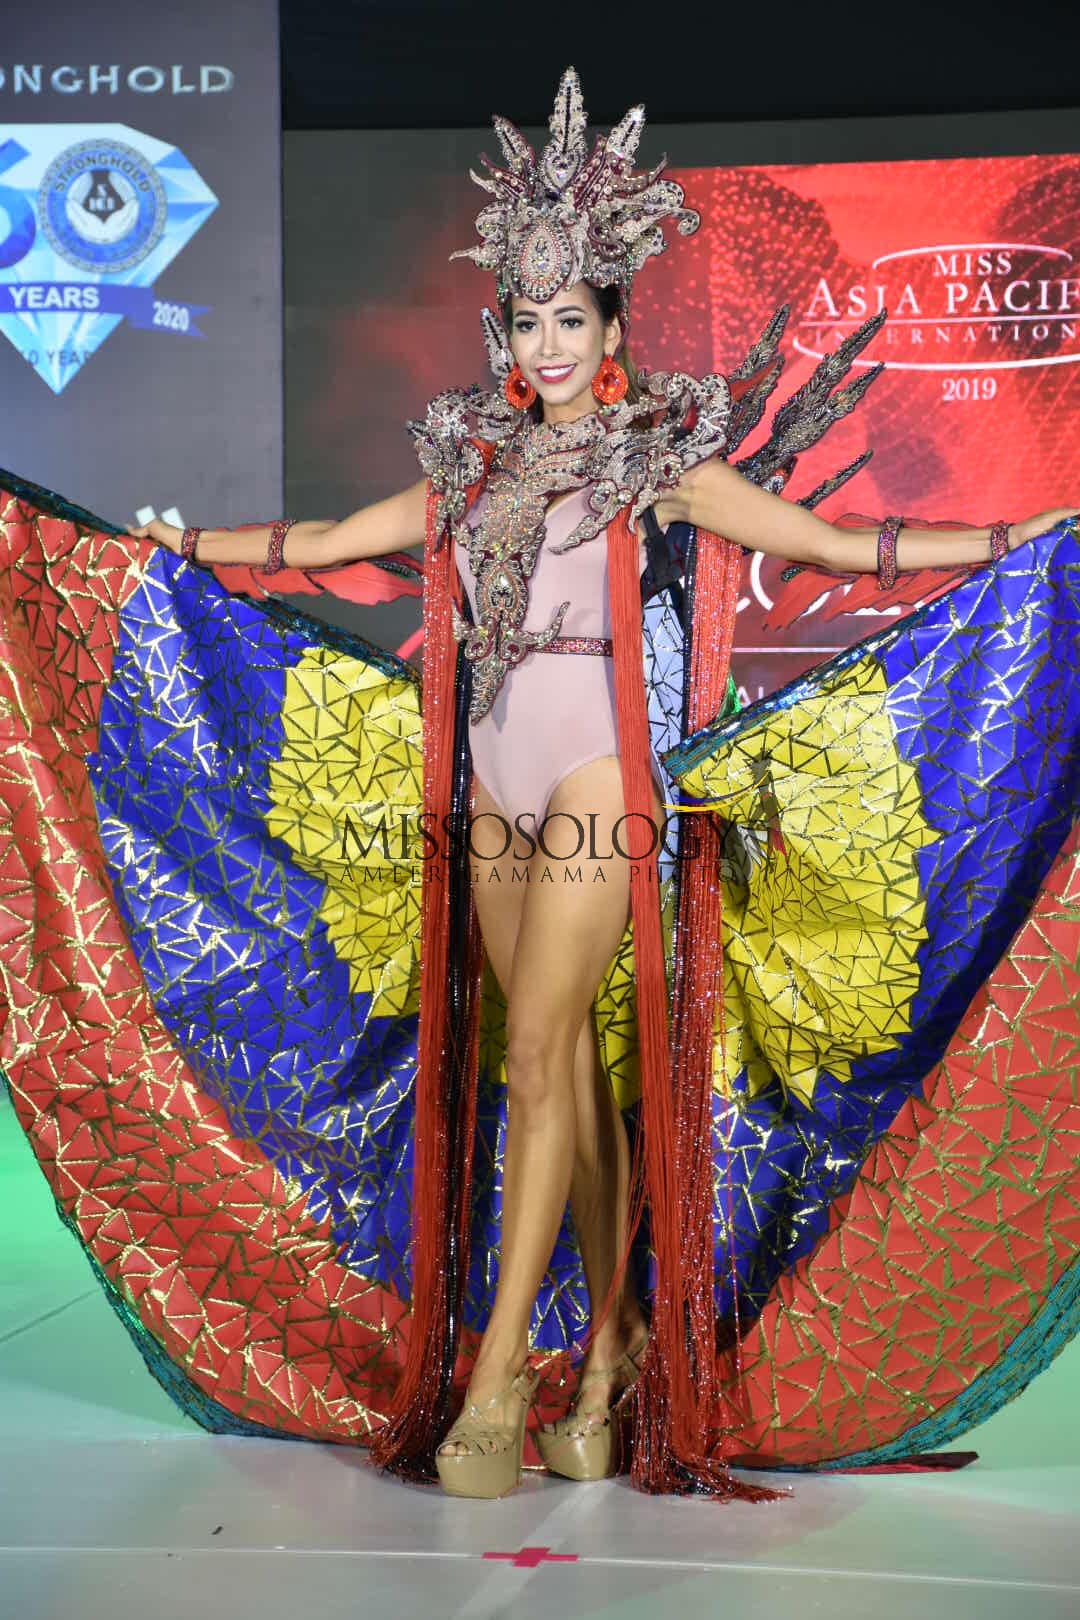 alejandra rodriguez osorio, miss asia pacific colombia 2019. - Página 2 71731710